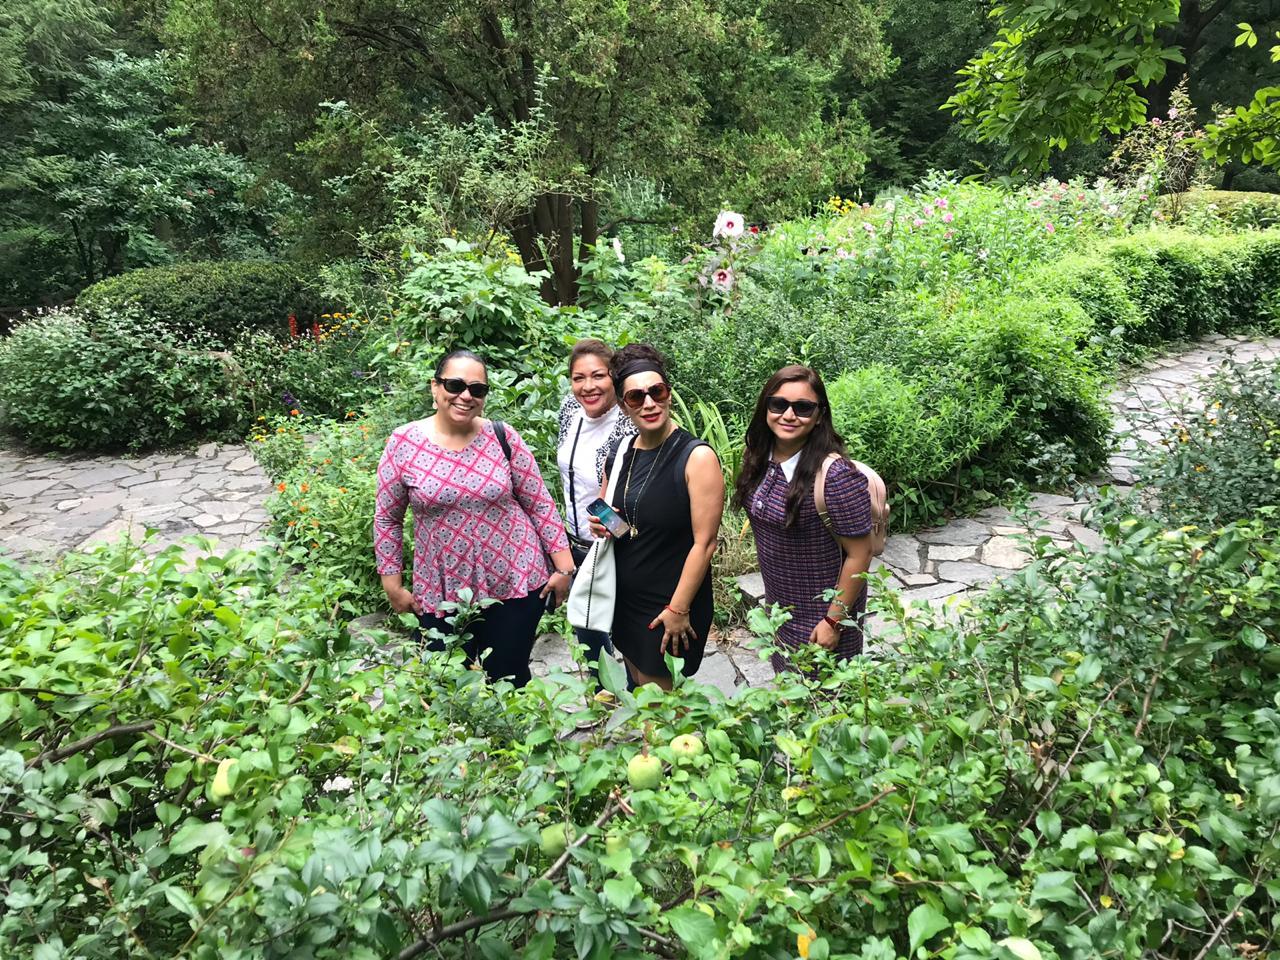 Central Park - Shakespeare Garden